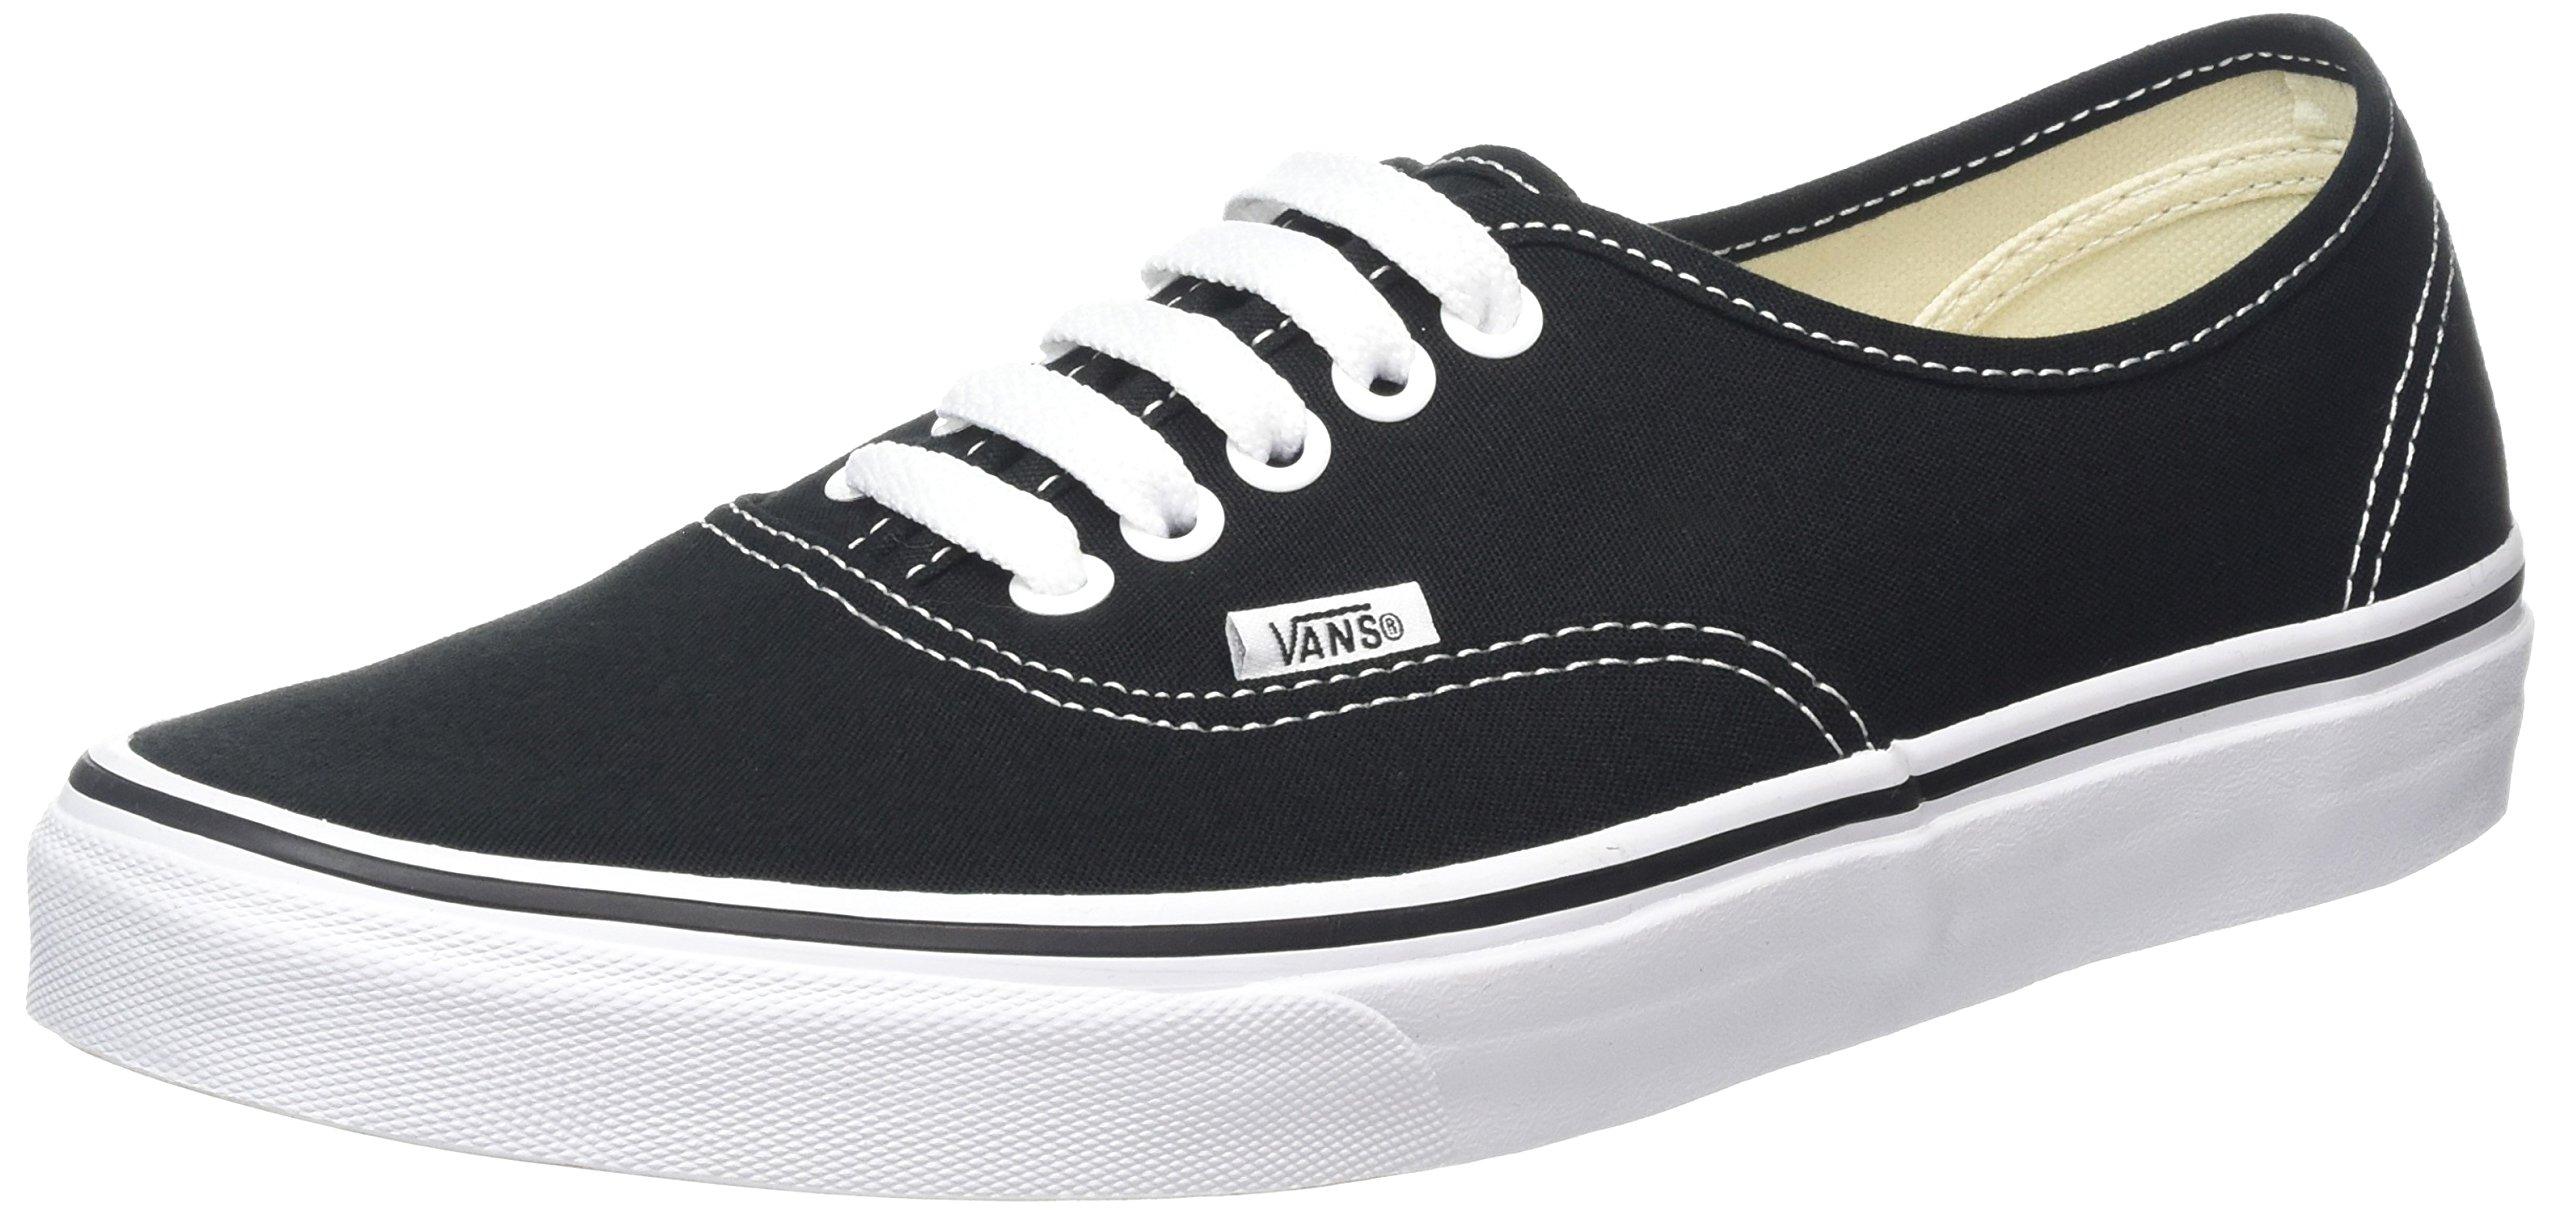 Vans Authentic Mens Womens Black White Canvas Skate Trainers, 6 UK